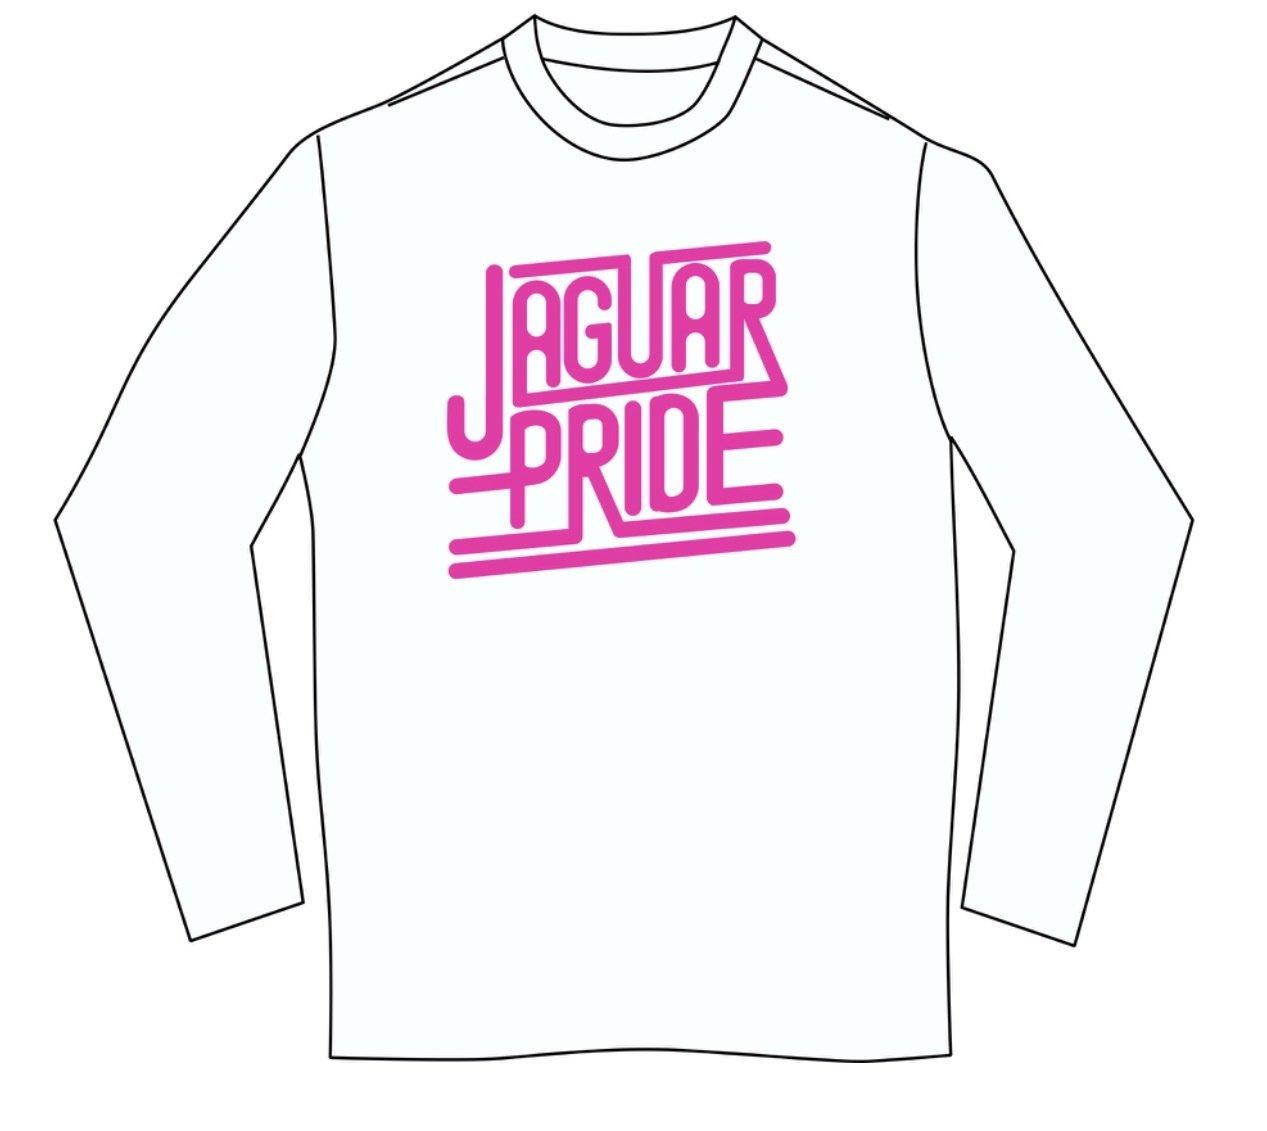 JAGUAR PRIDE Long sleeved T-shirt--NEON PINK IMPRINT